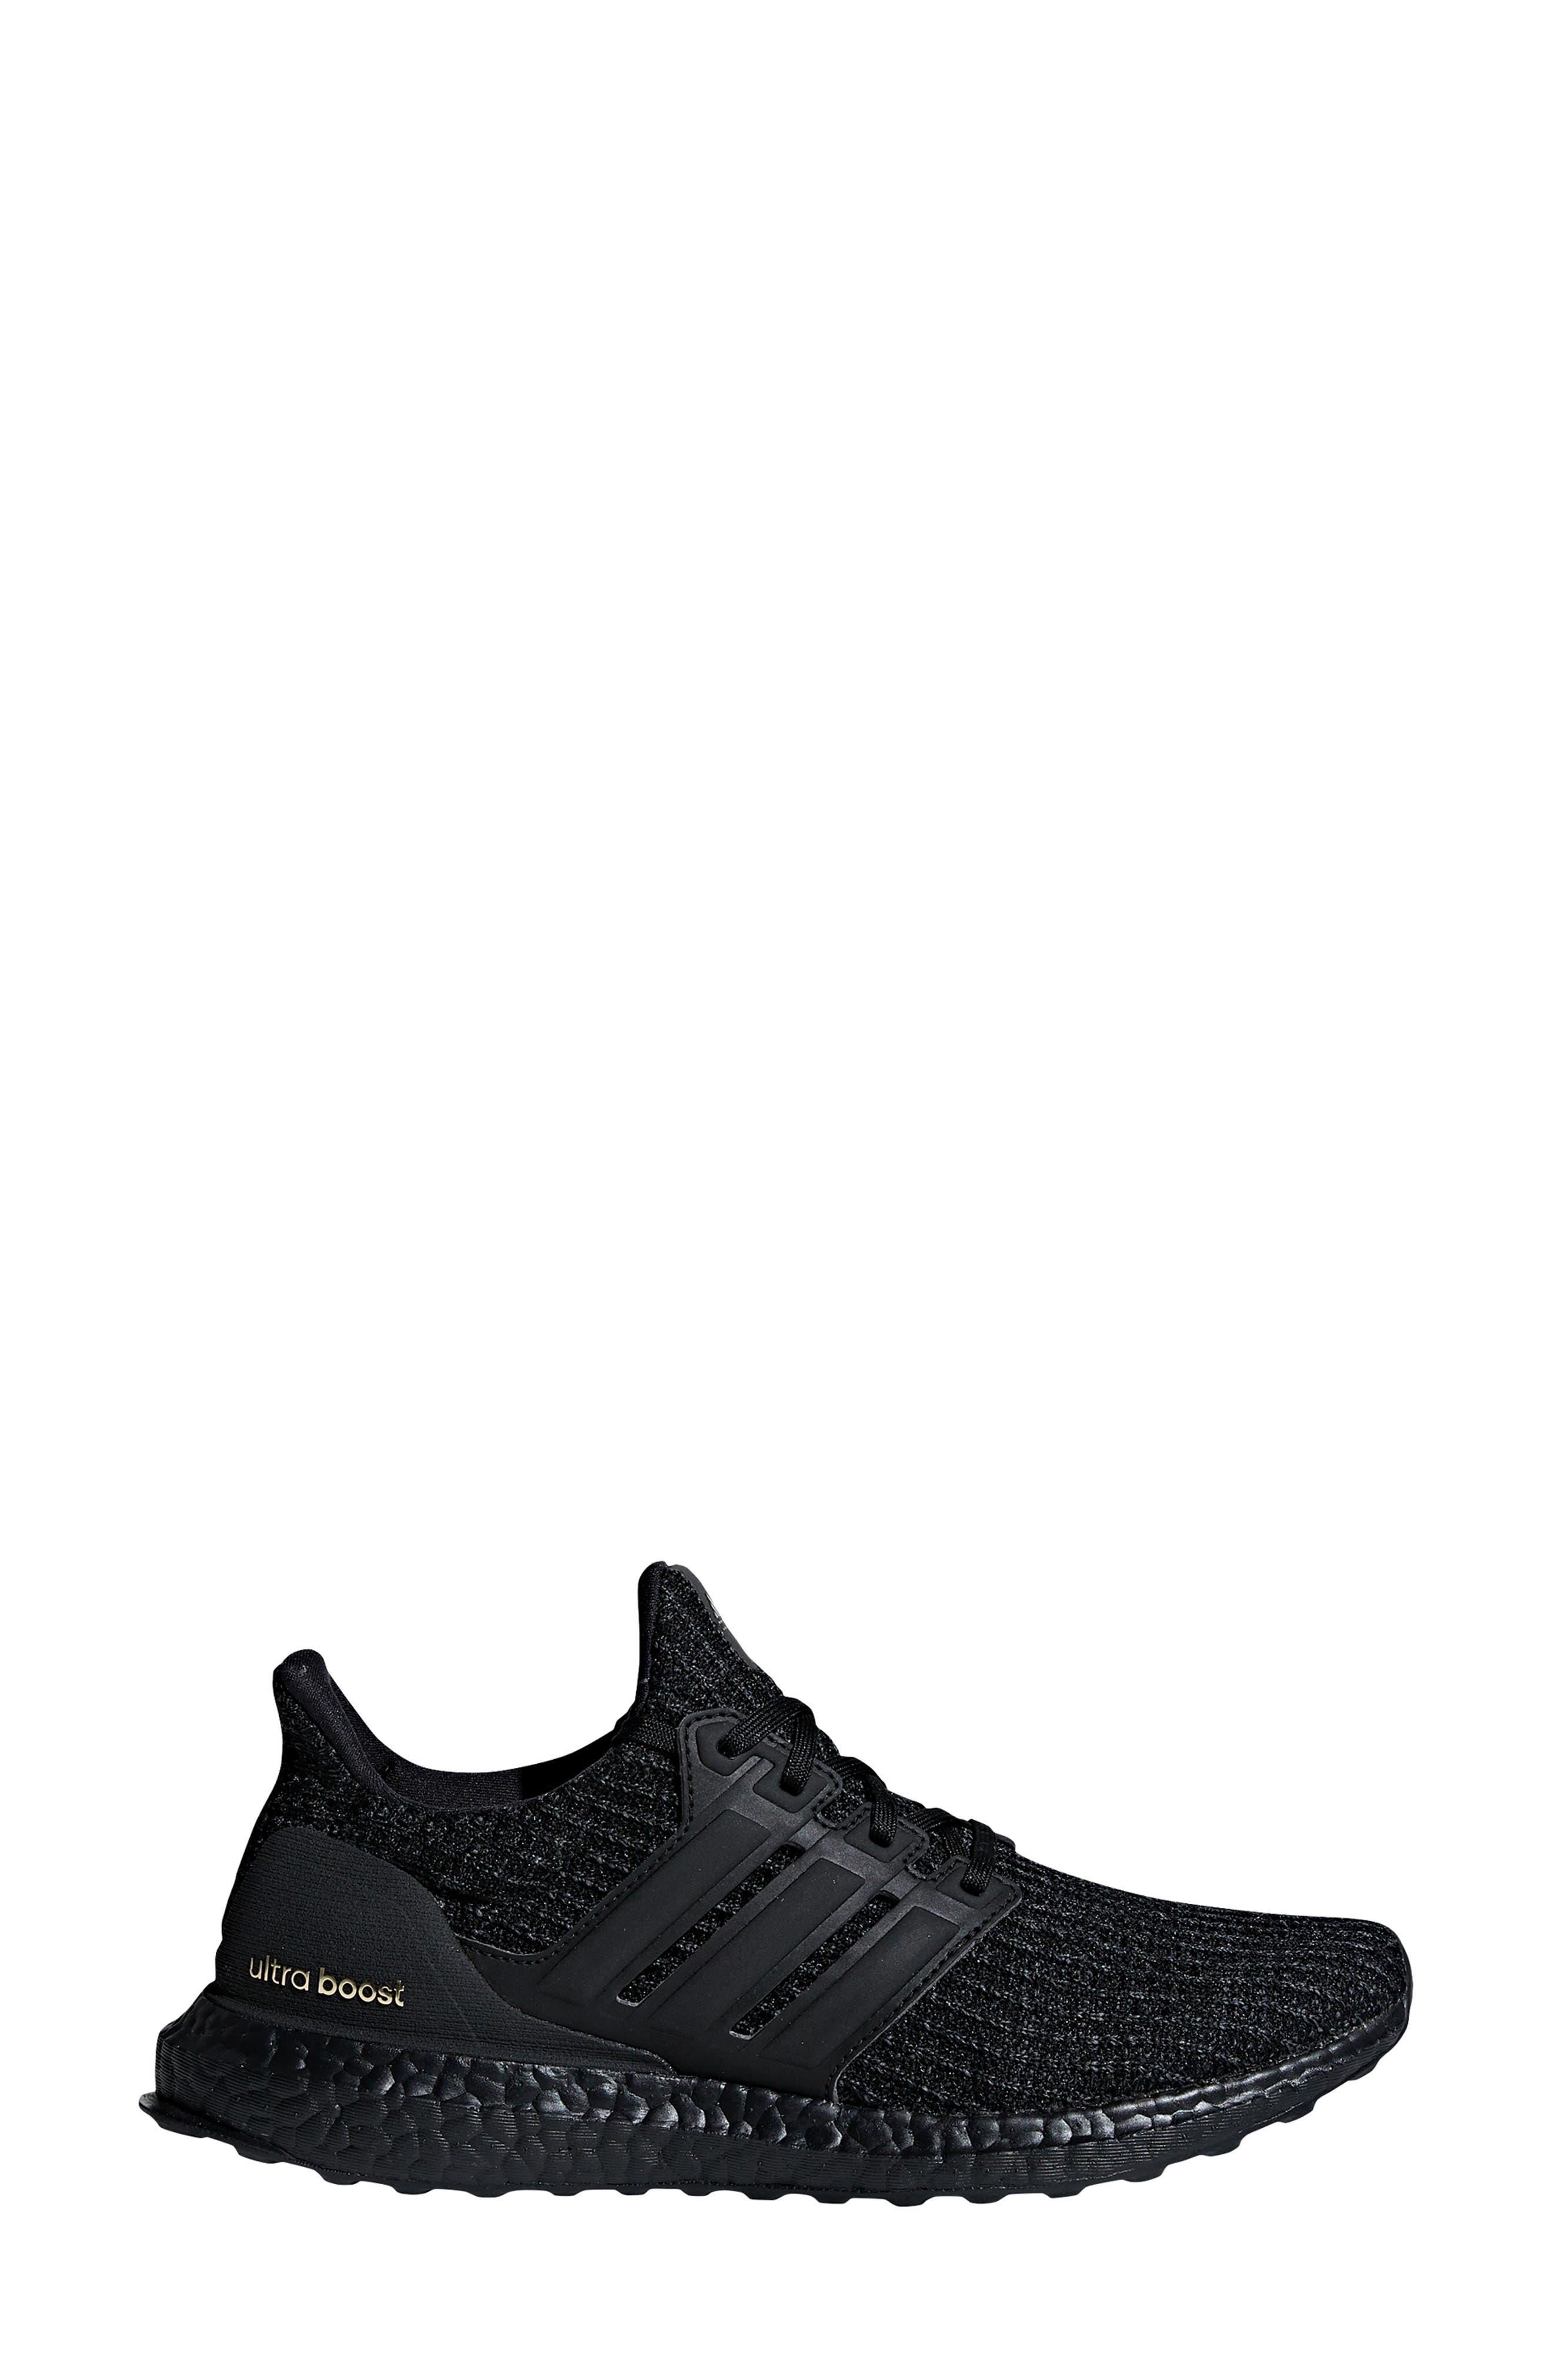 ADIDAS, 'UltraBoost' Running Shoe, Alternate thumbnail 3, color, CORE BLACK/ GOLD METALLIC